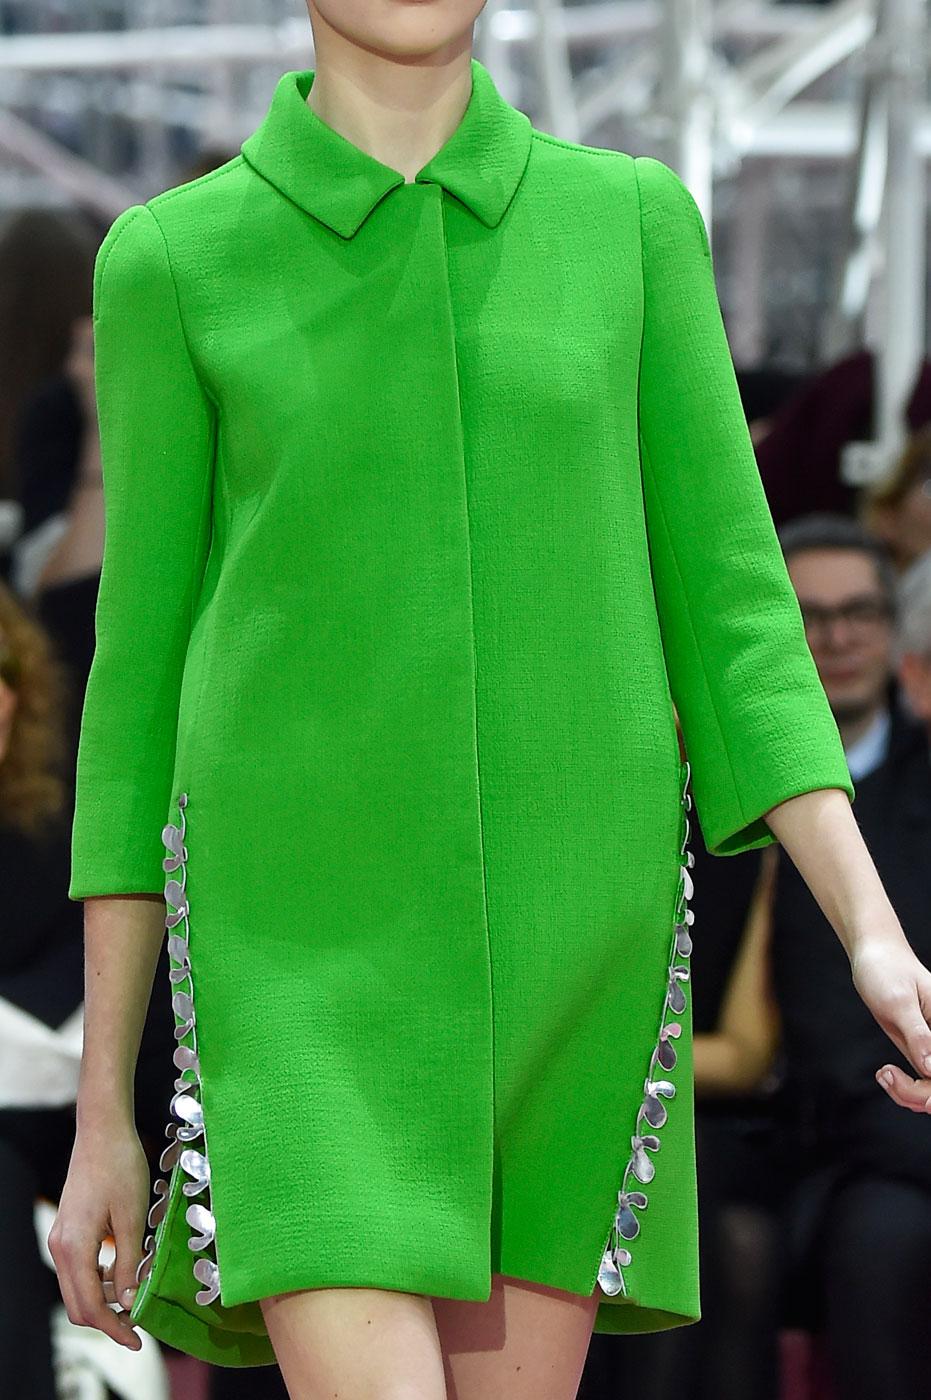 Christian-Dior-fashion-runway-show-close-ups-haute-couture-paris-spring-summer-2015-the-impression-035